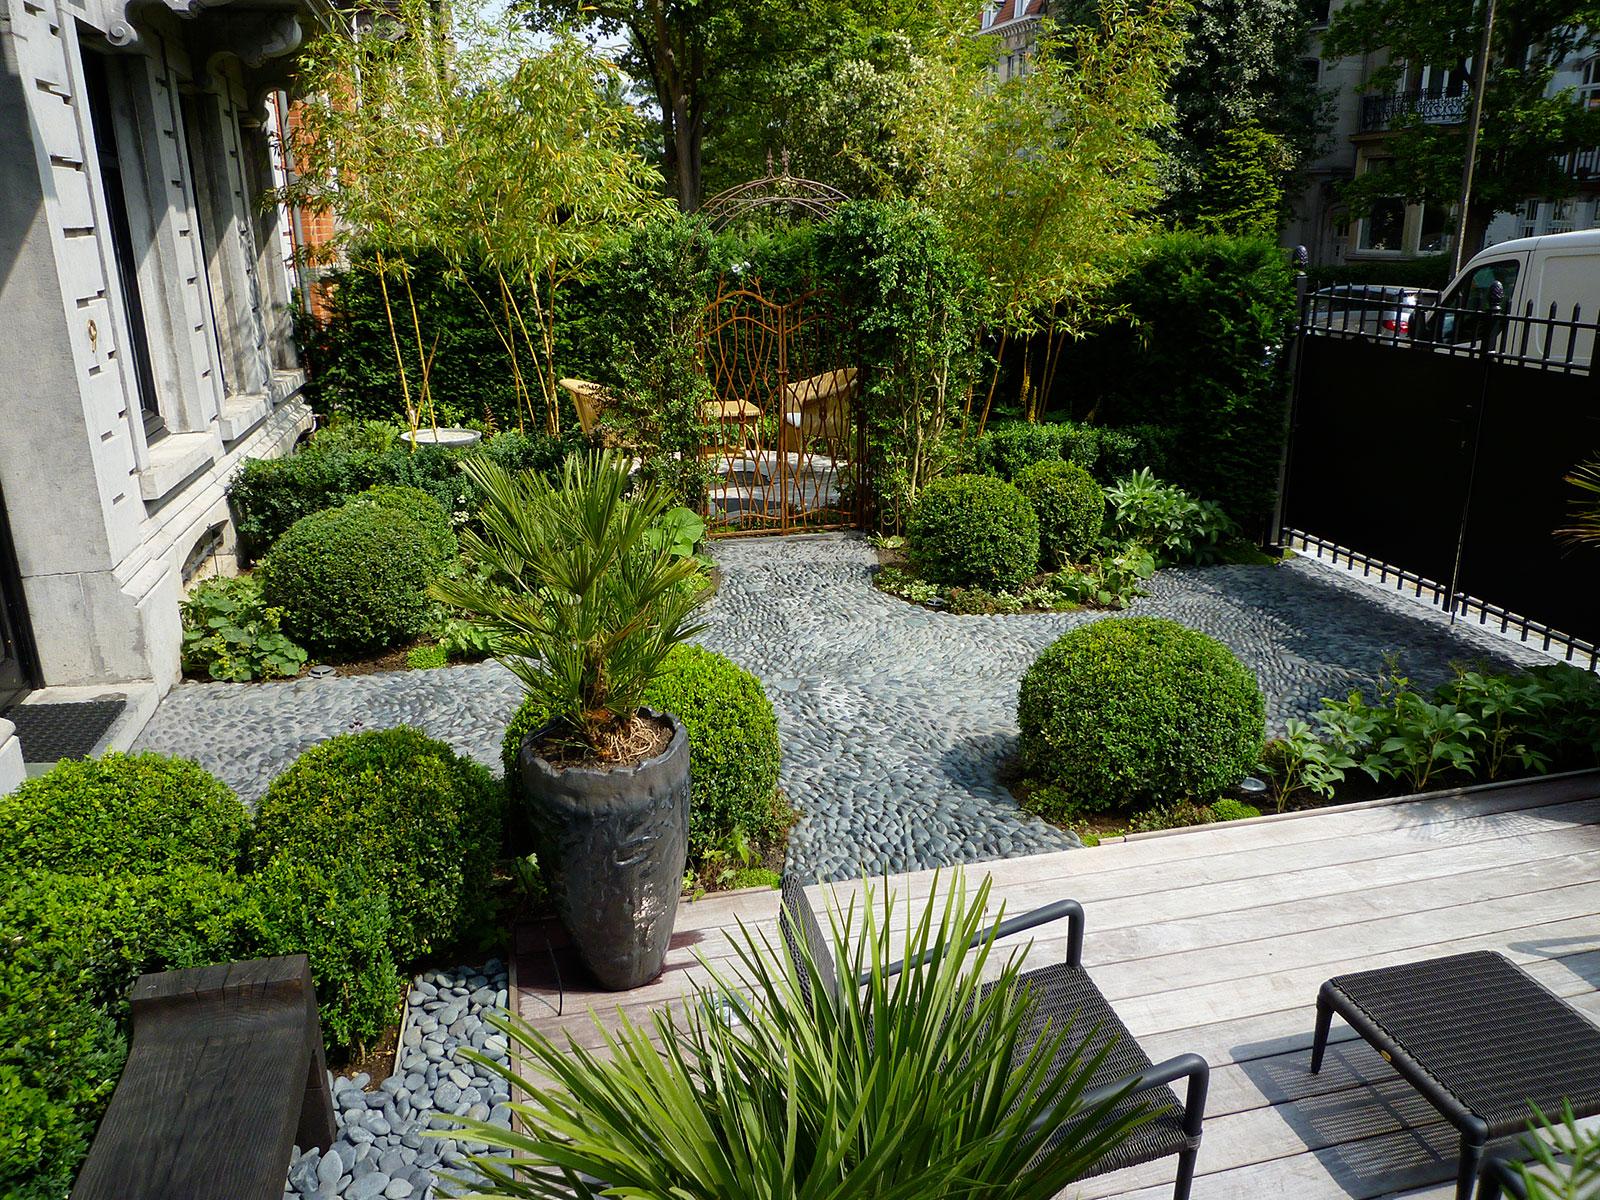 Cr ations entre ciel et vert for Restaurant le jardin en ville